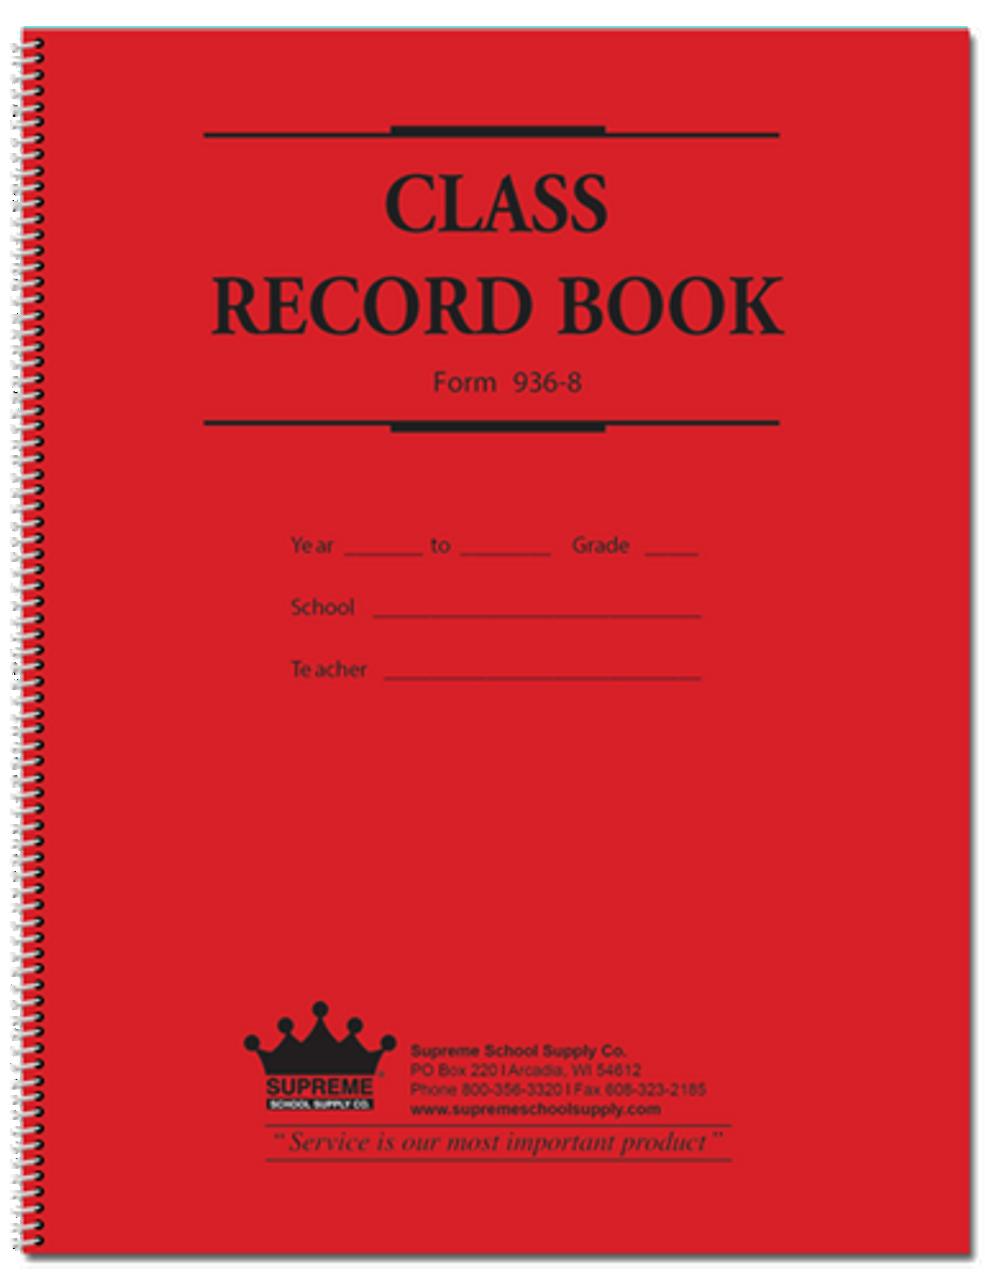 Class Record Book, 8 Subject, 9 Week (936 Series) (936-8)